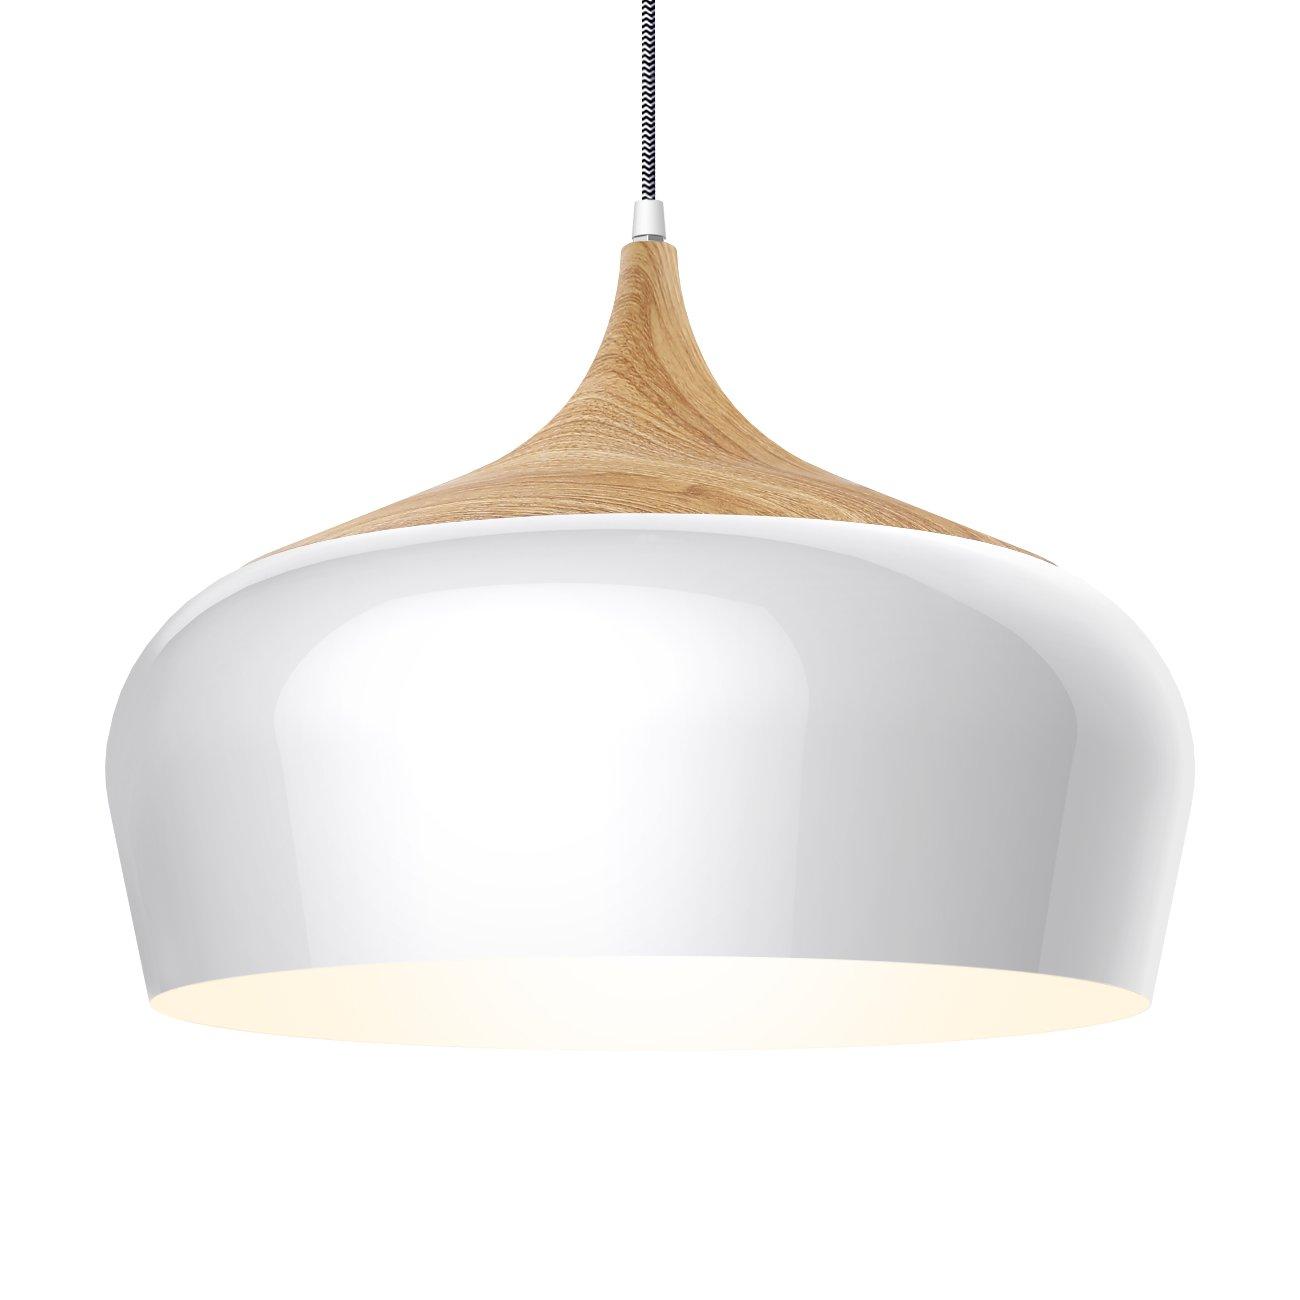 225 & Pendant Light Bedroom: Amazon.com